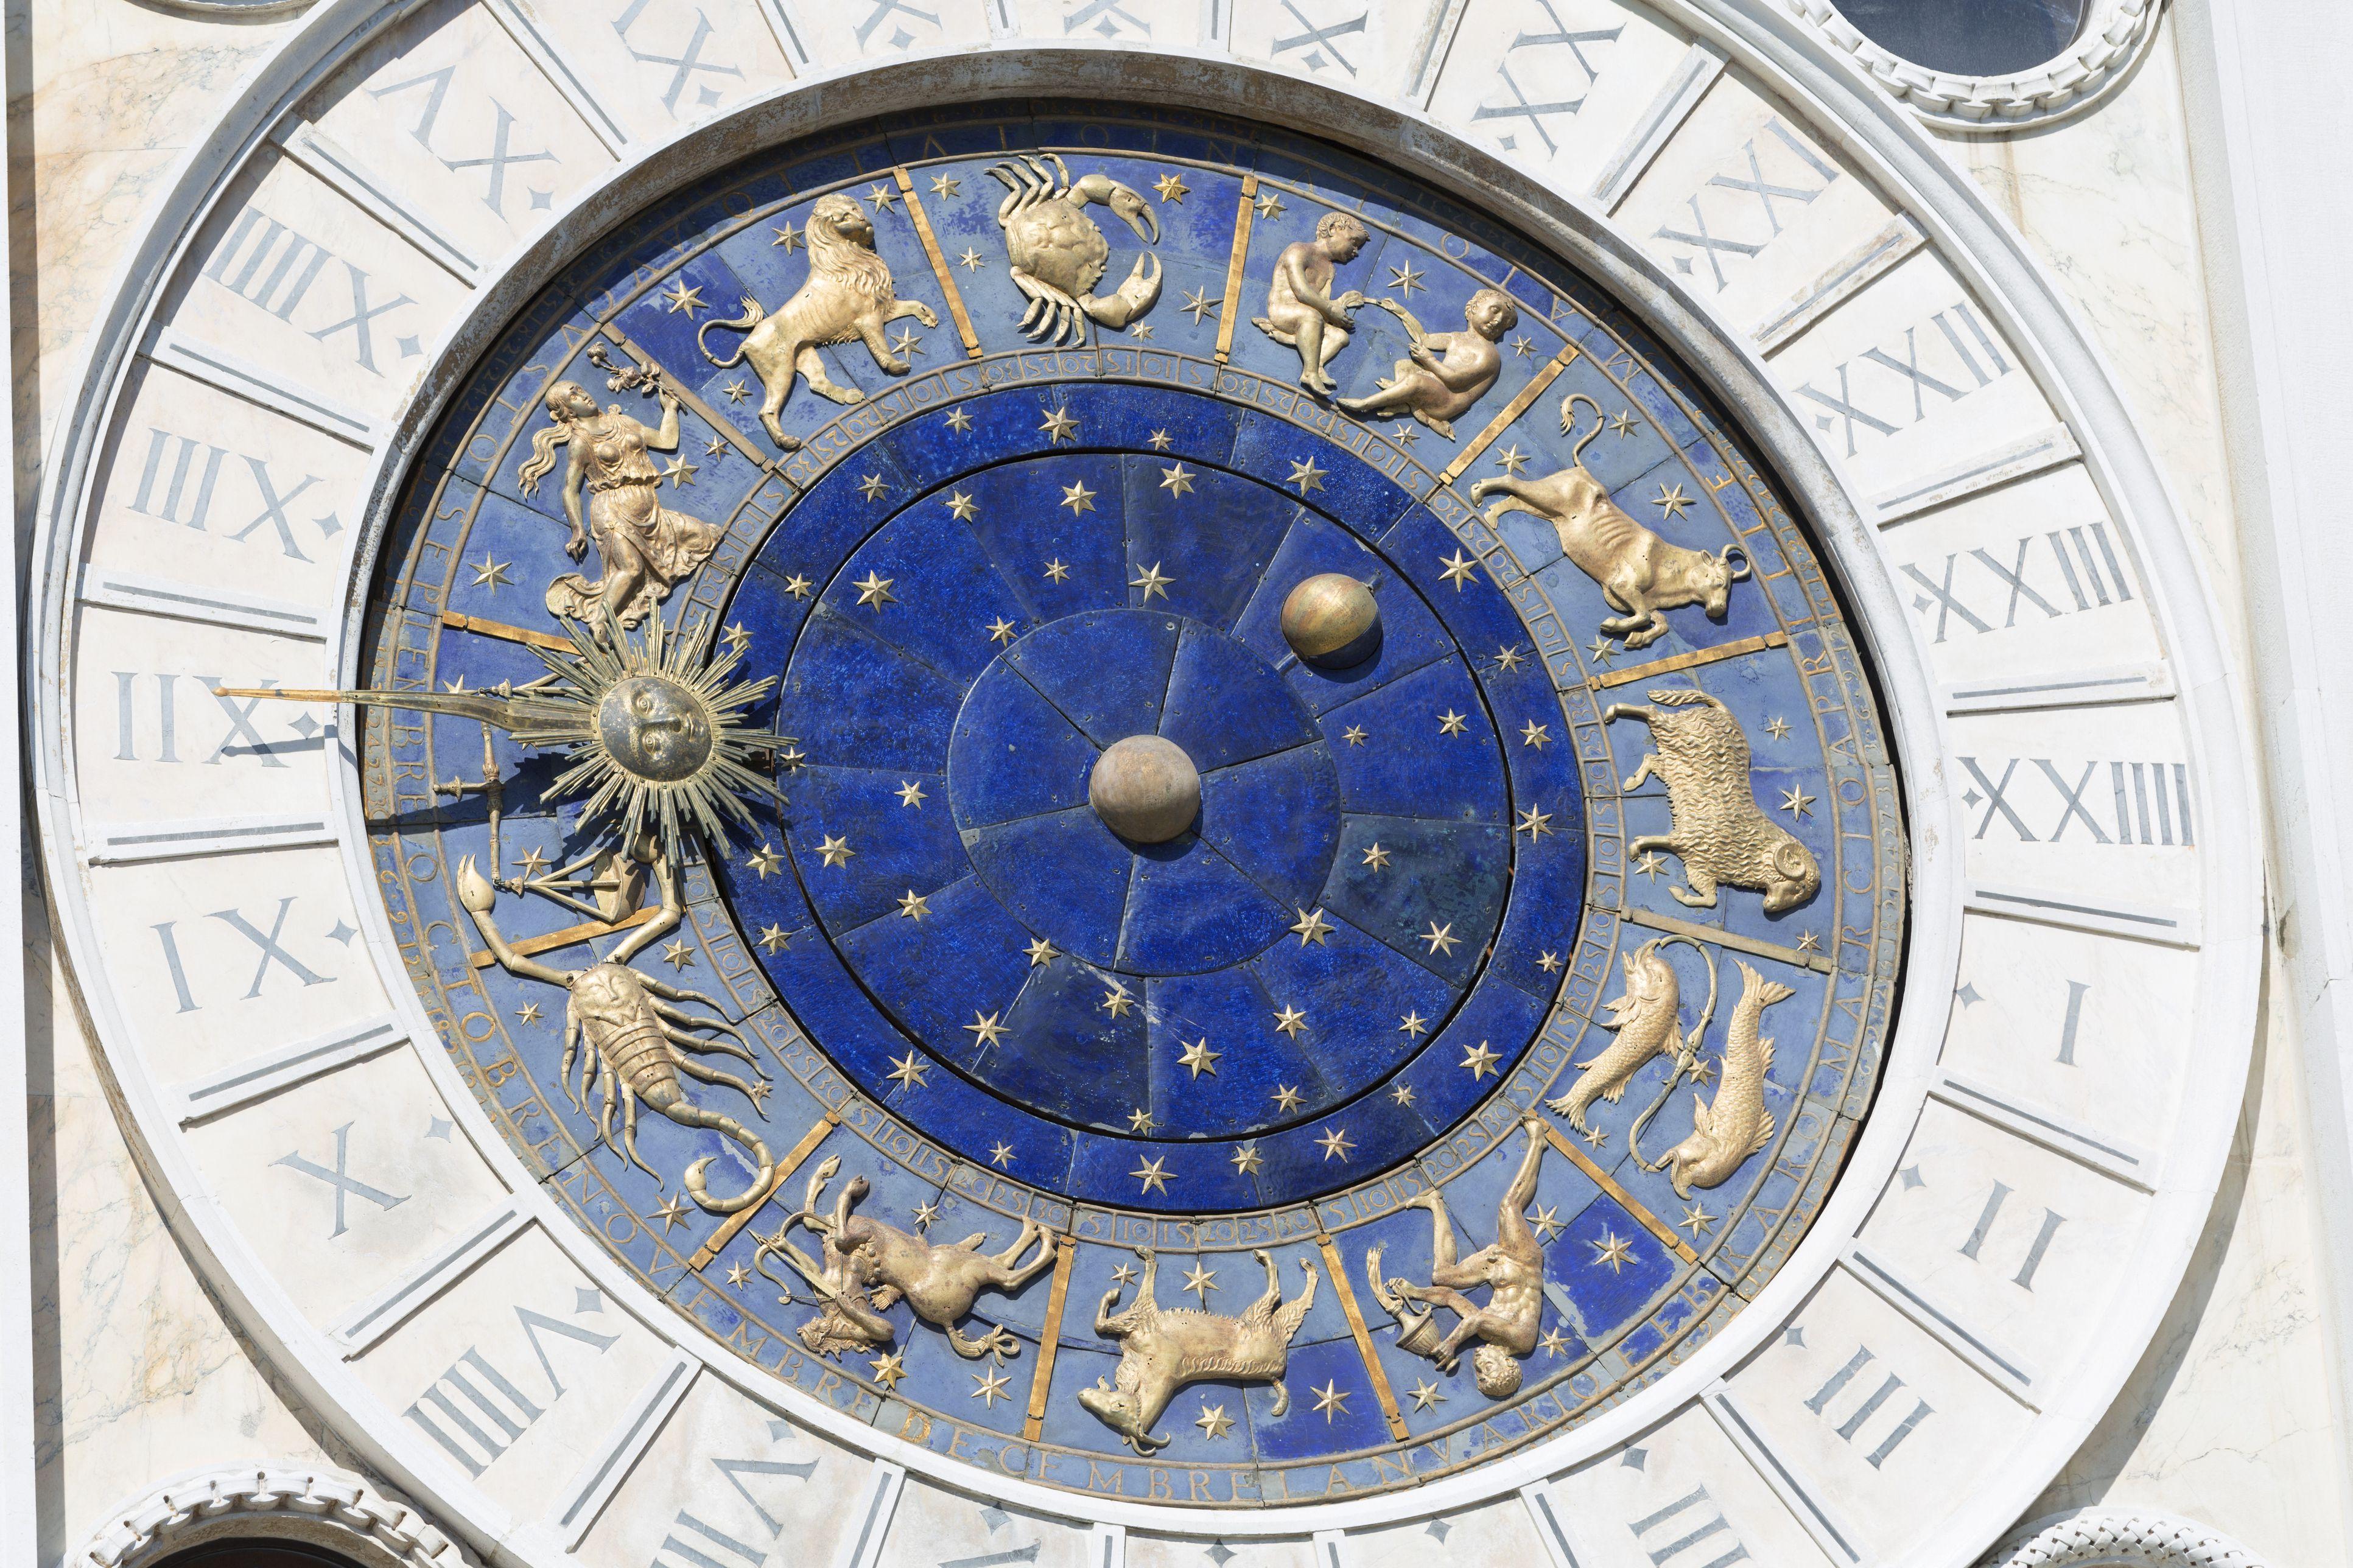 Zodiac Signs Lesson Plan For Esl Classes